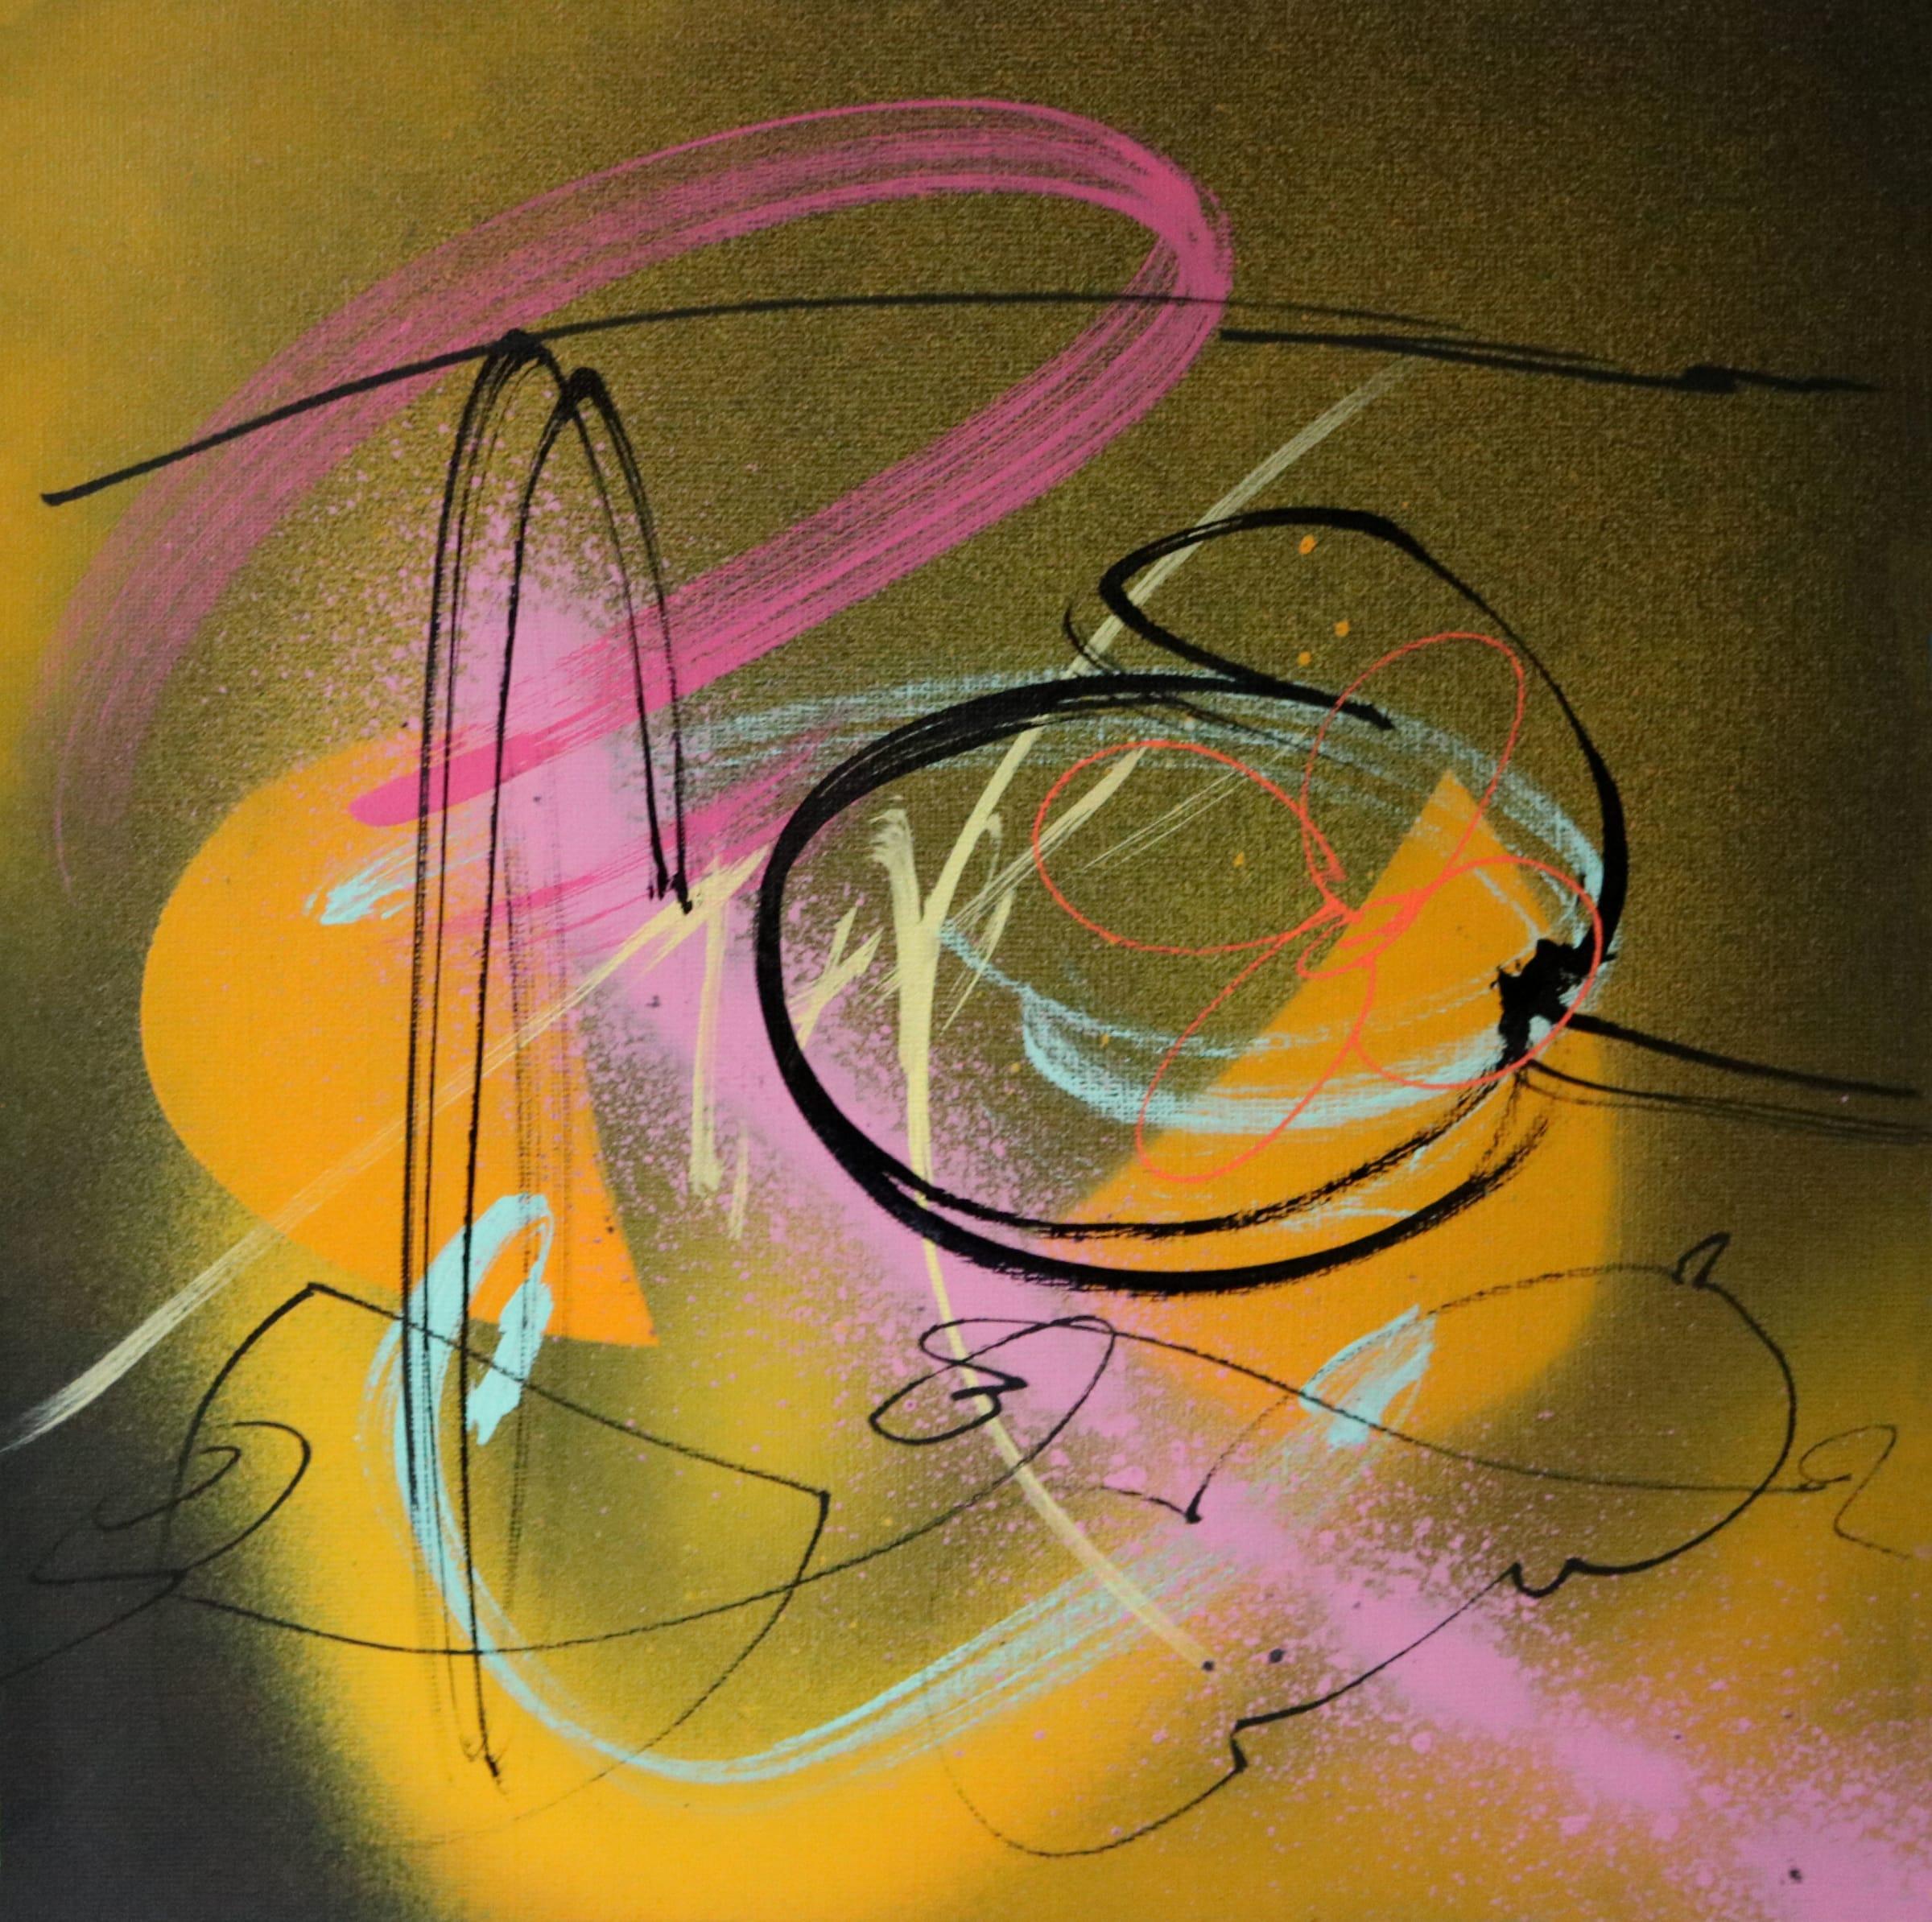 "<span class=""link fancybox-details-link""><a href=""/artists/216-simon-williams/works/7414-simon-williams-cheops-2018/"">View Detail Page</a></span><div class=""artist""><strong>Simon Williams</strong></div> b. 1961 <div class=""title""><em>'Cheops'</em>, 2018</div> <div class=""medium"">Spray paint and acrylic ink on coloured paper.</div> <div class=""dimensions"">h. 30 cm x w. 30 cm</div><div class=""price"">£550.00</div><div class=""copyright_line"">Own Art: £55 x 10 months, 0% APR</div>"